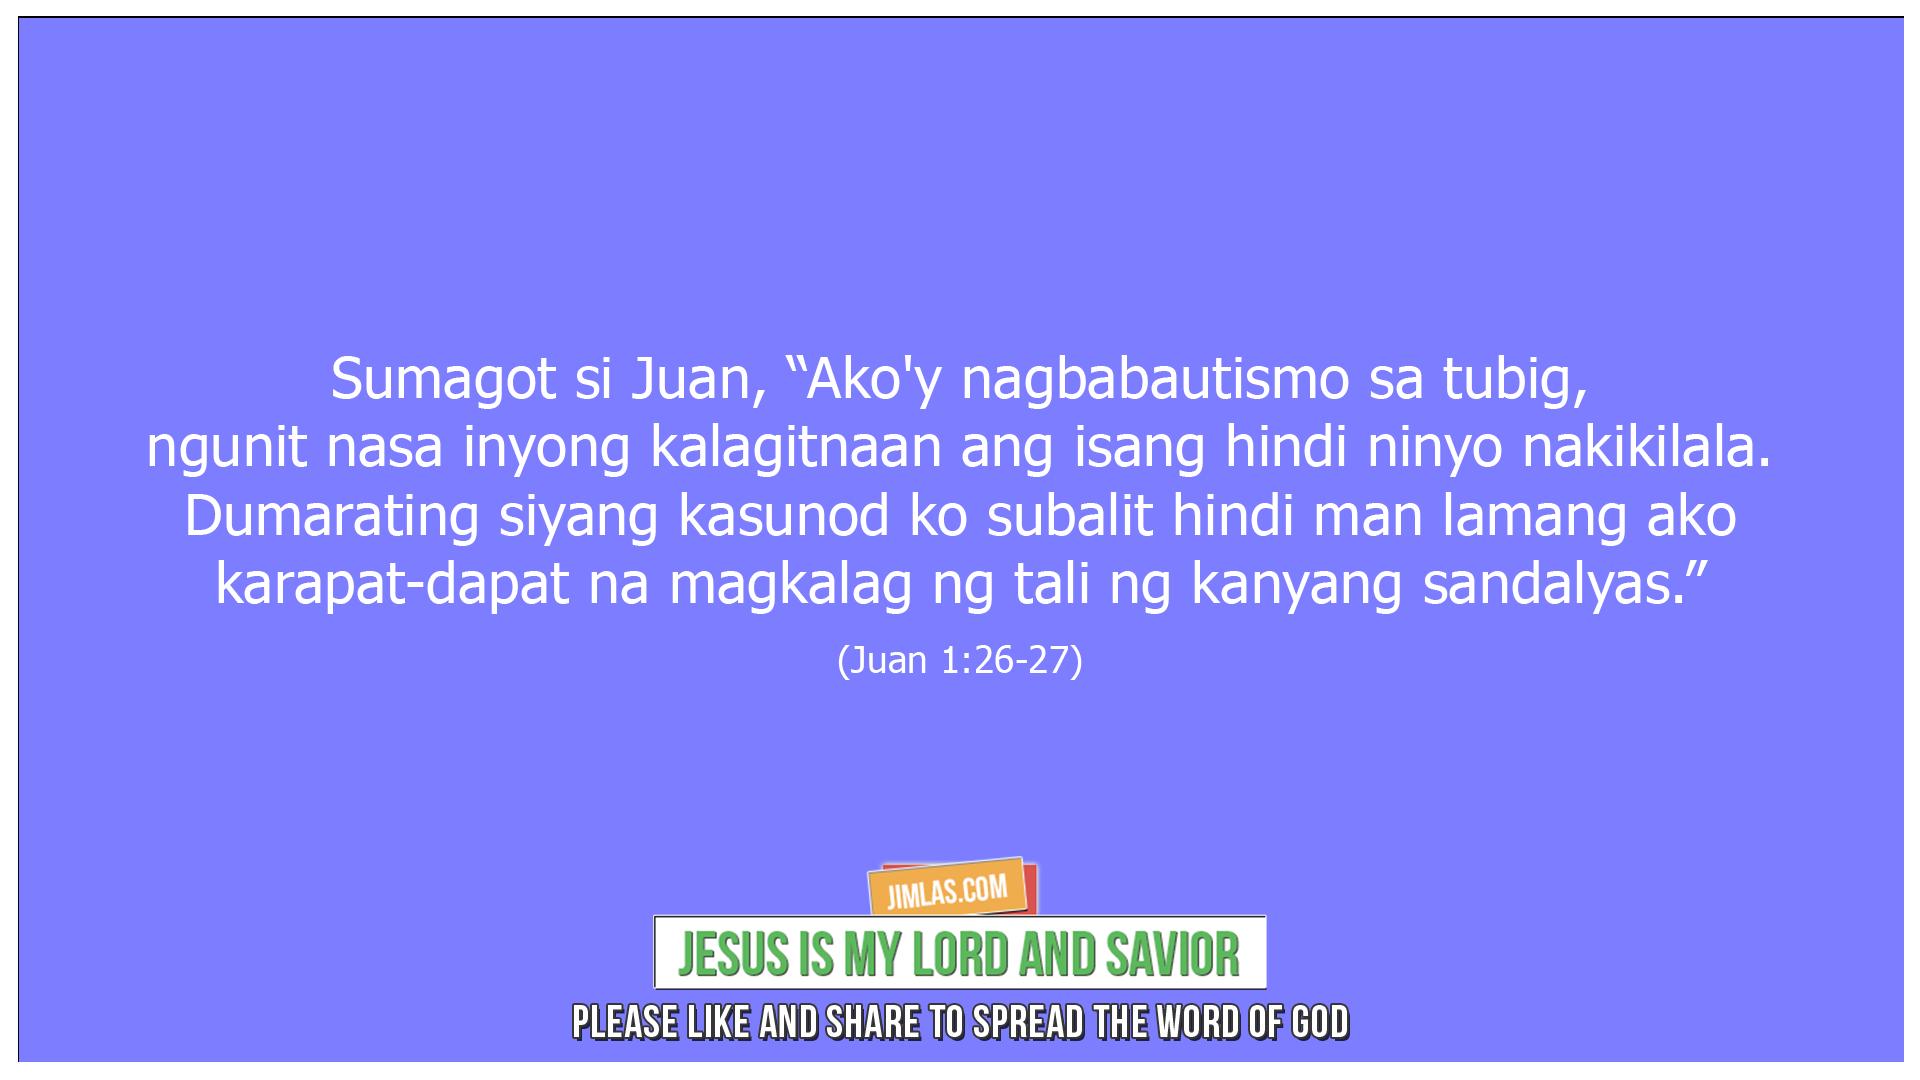 Juan 1 26-27, Juan 1:26-27